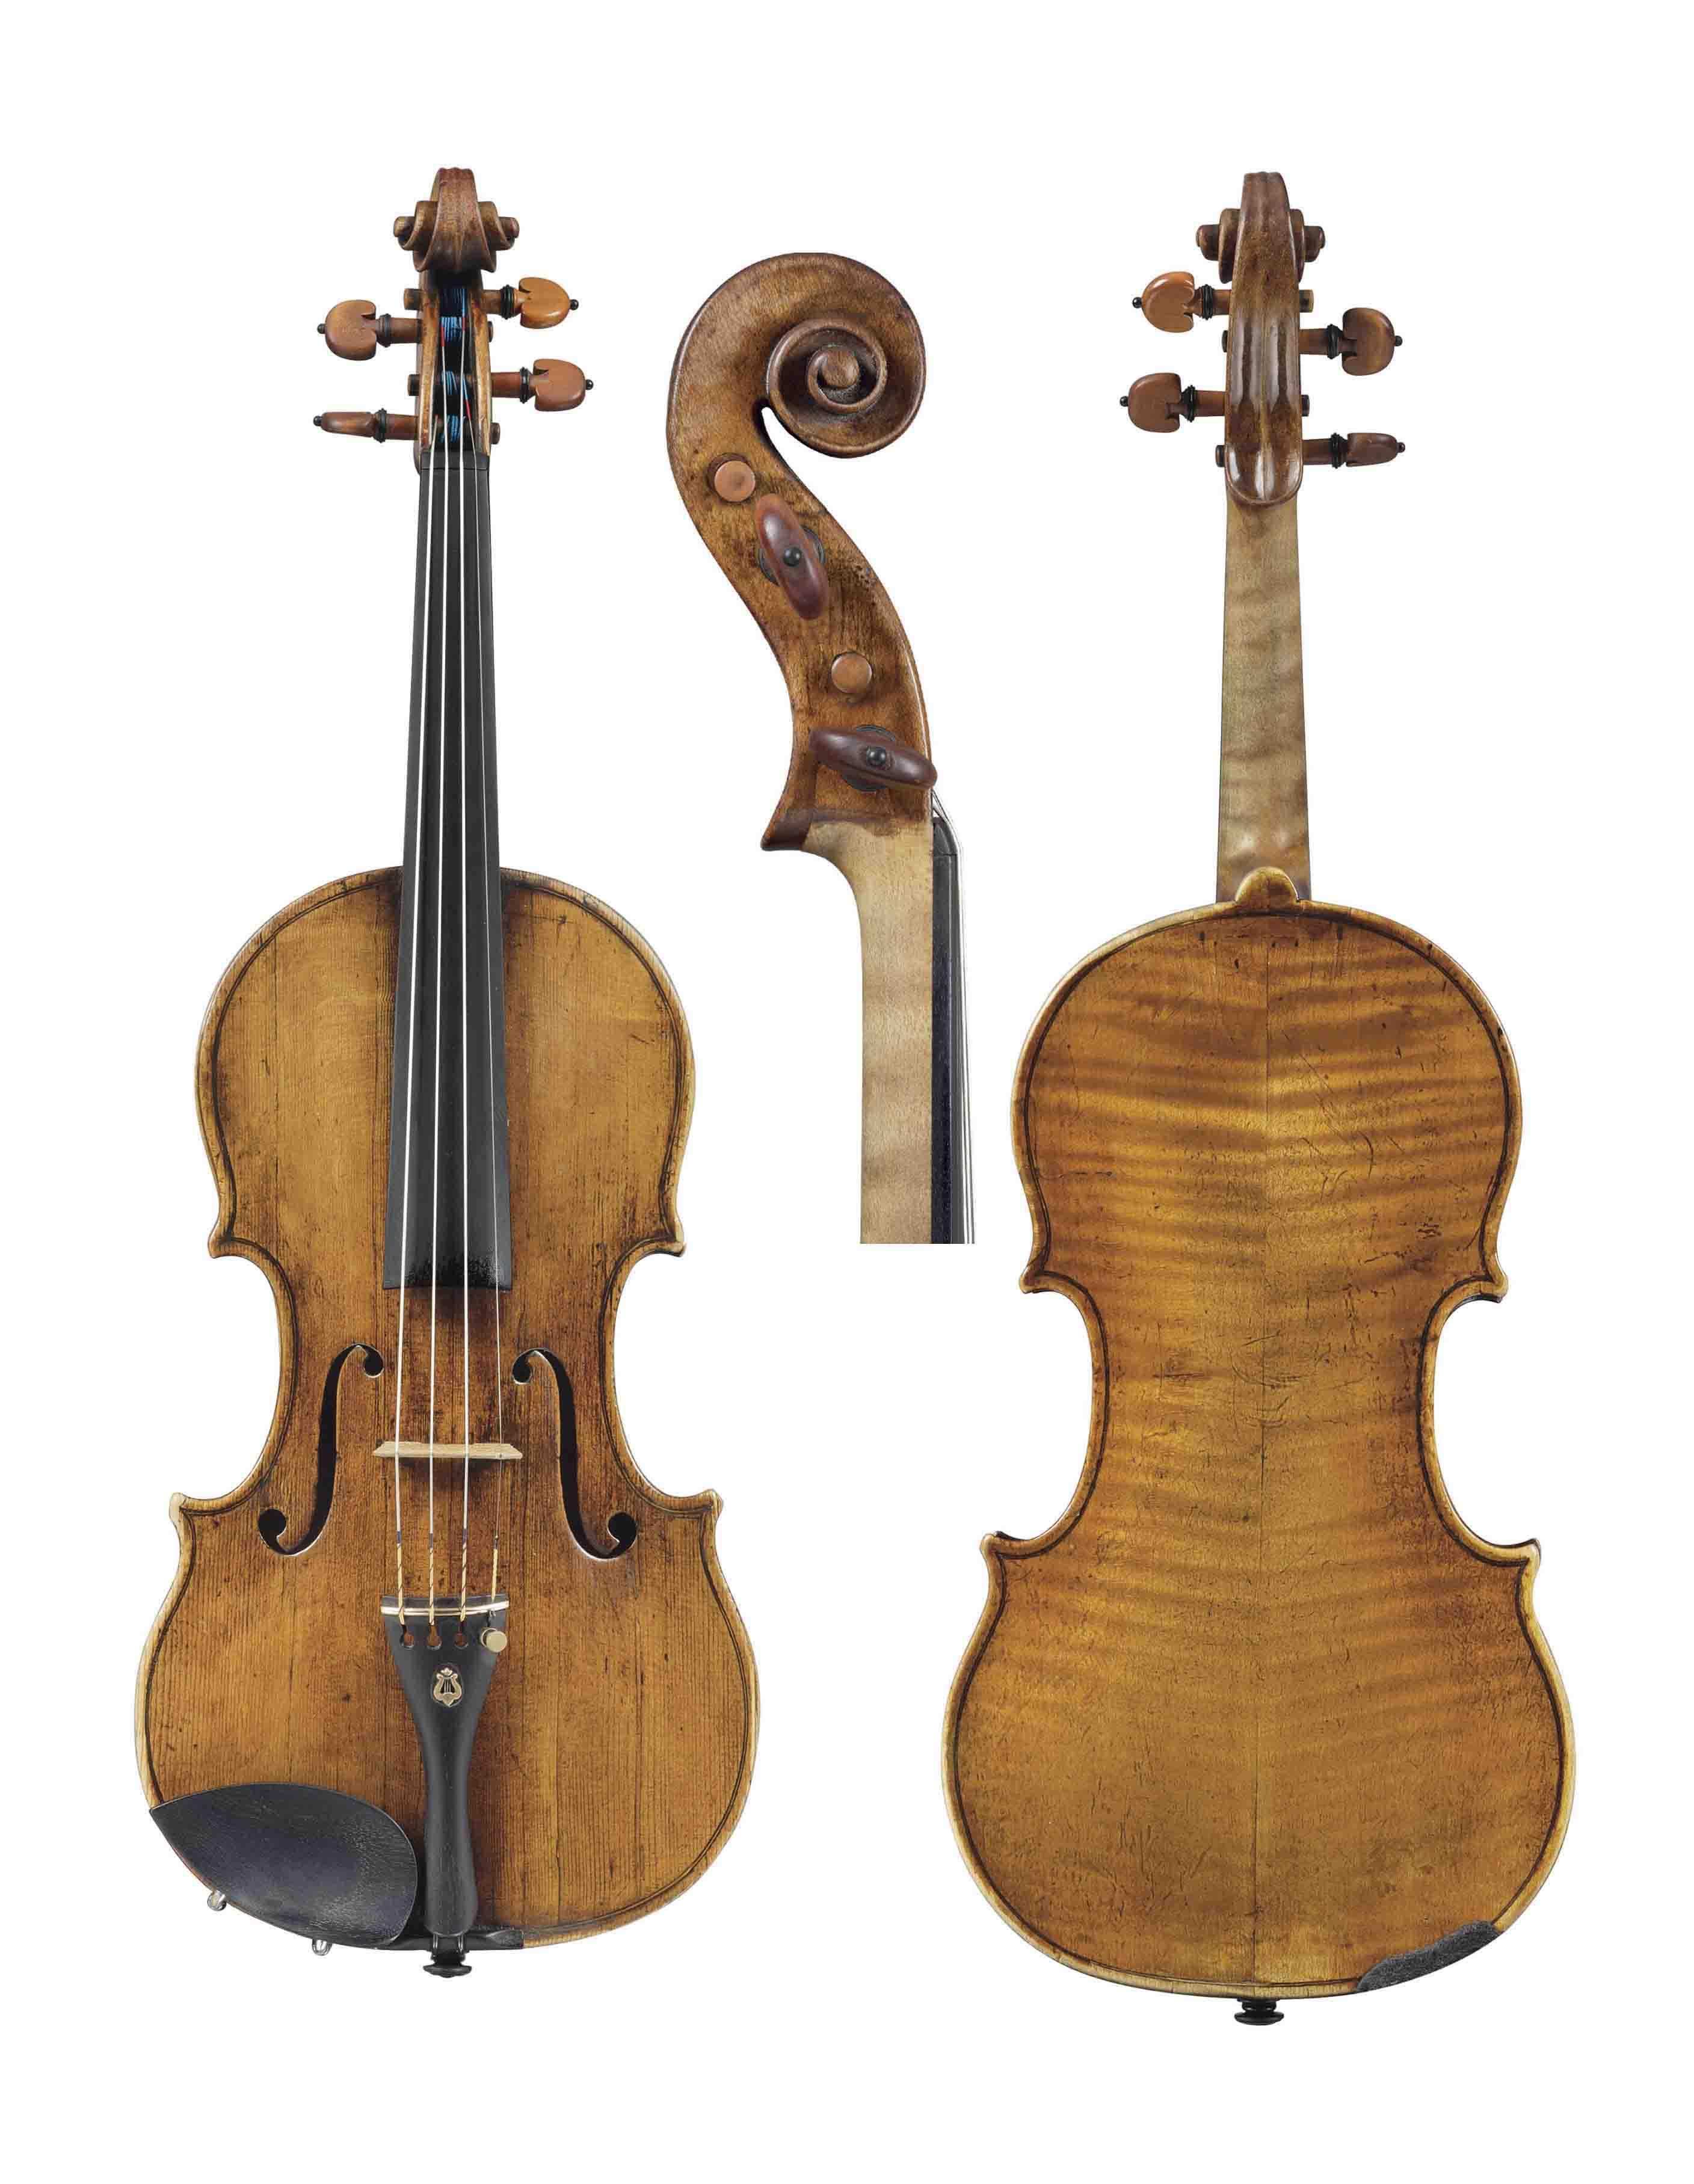 Violin by Januarius Gagliano, Naples 1774 - Photography ...